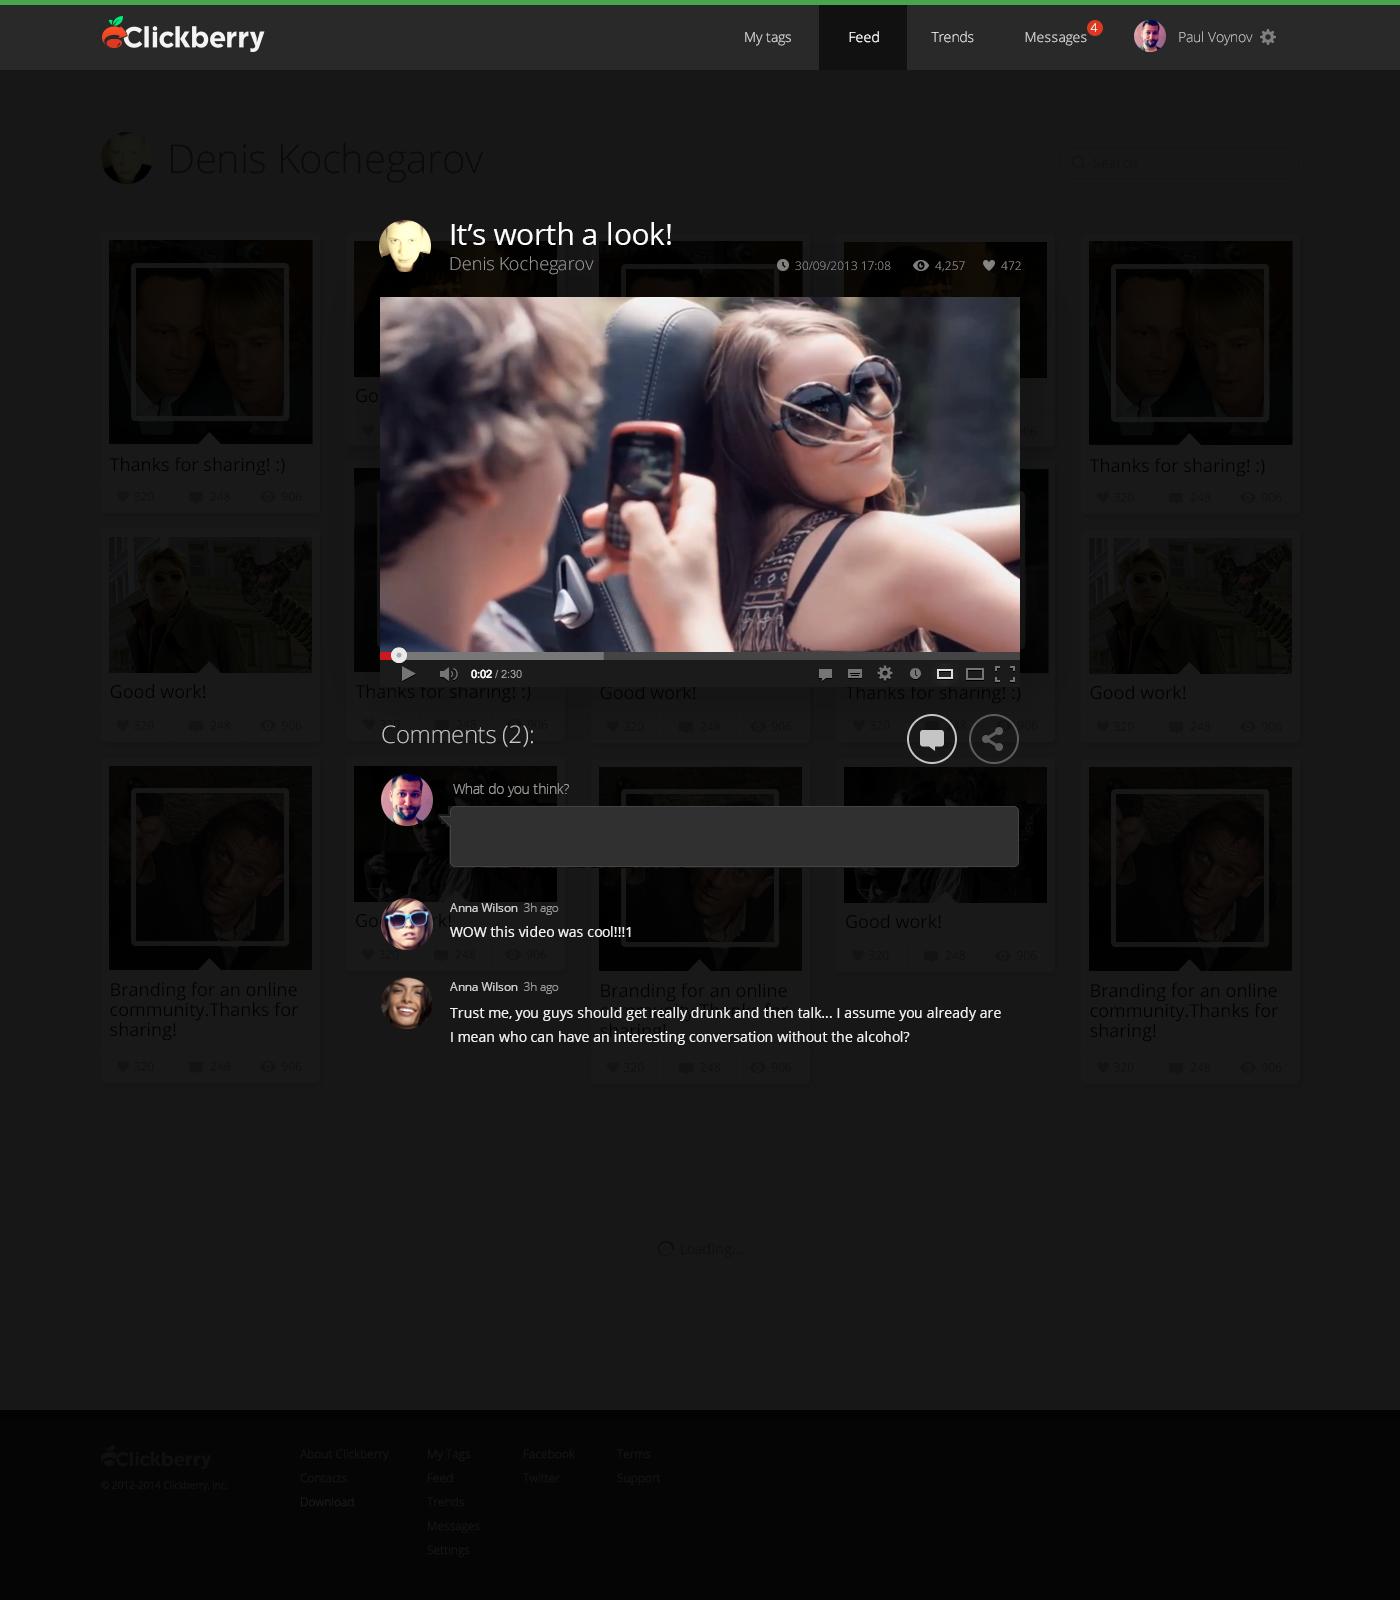 clickberry_portal4